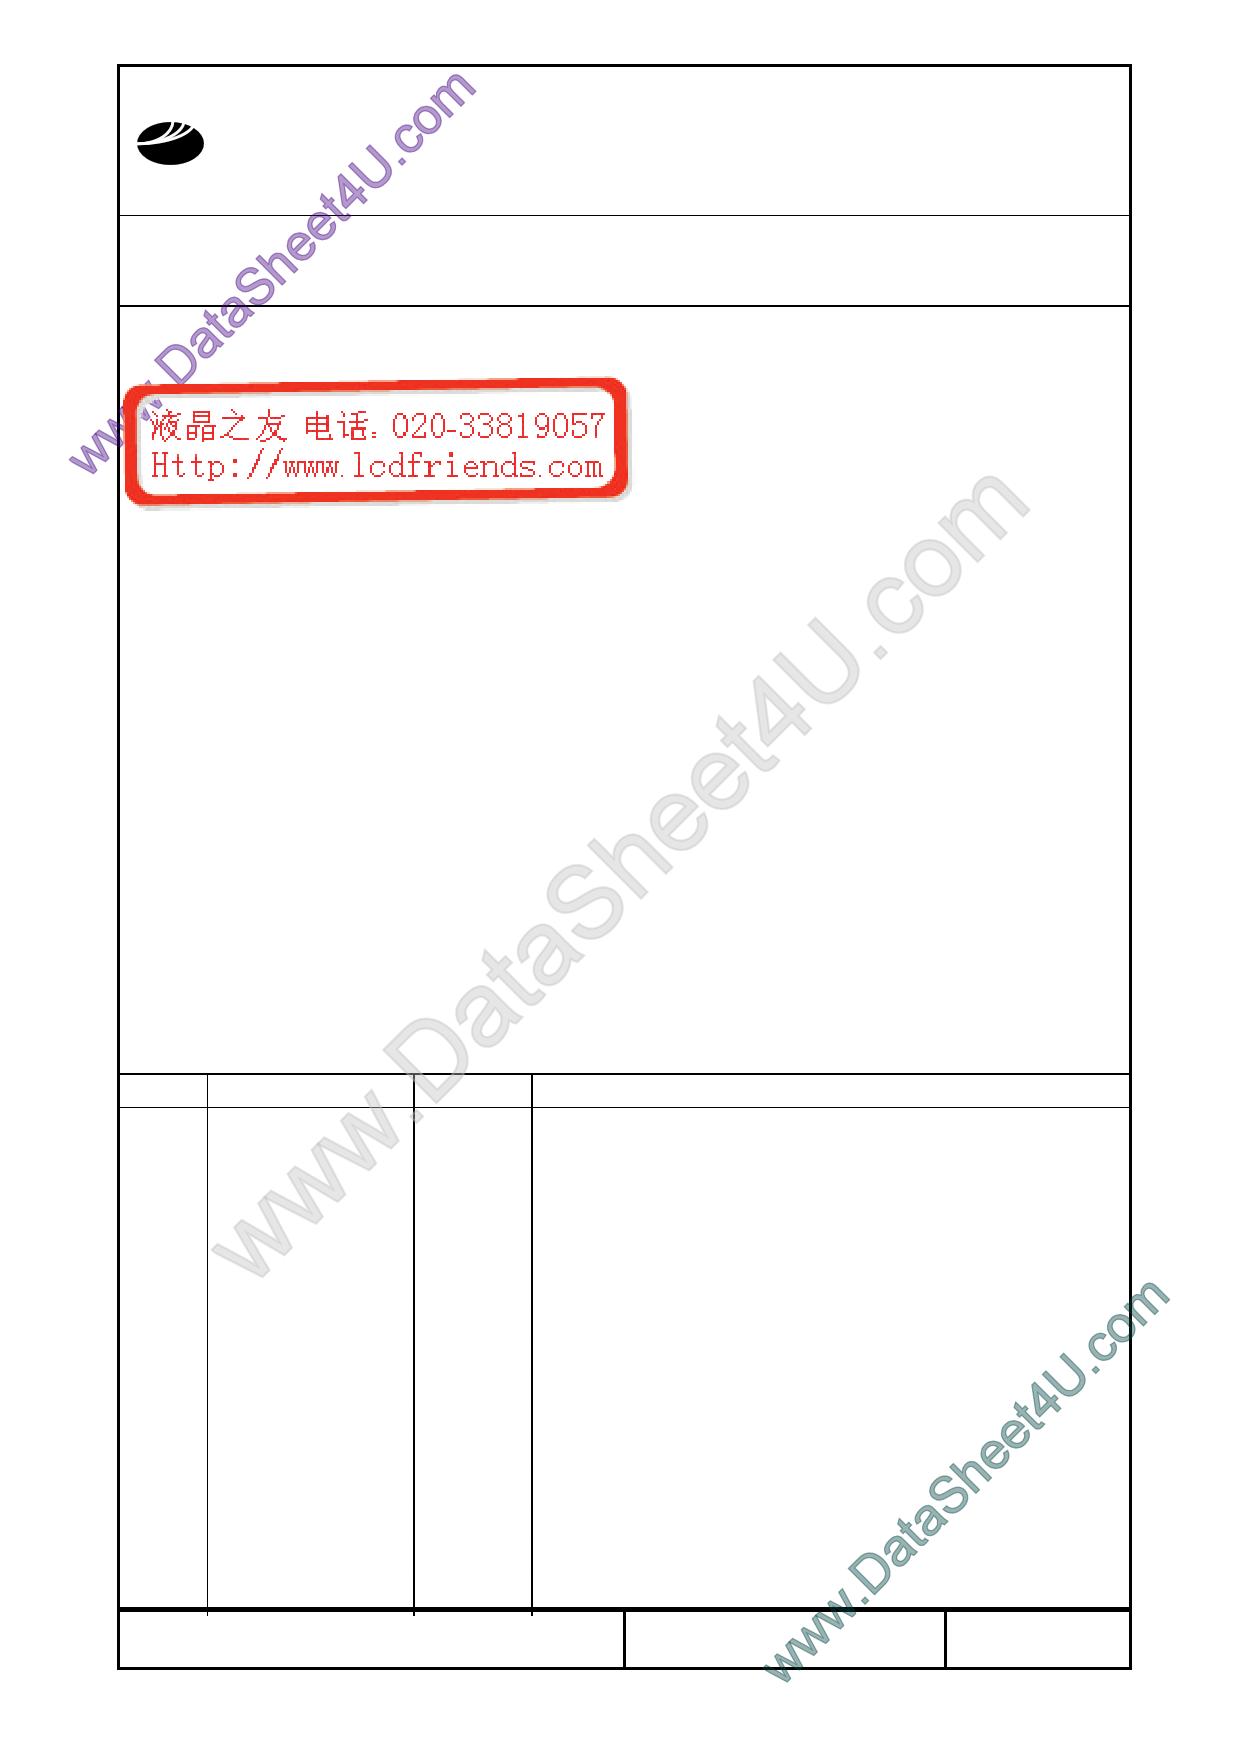 T-51381L064J_FW_P_AA datasheet